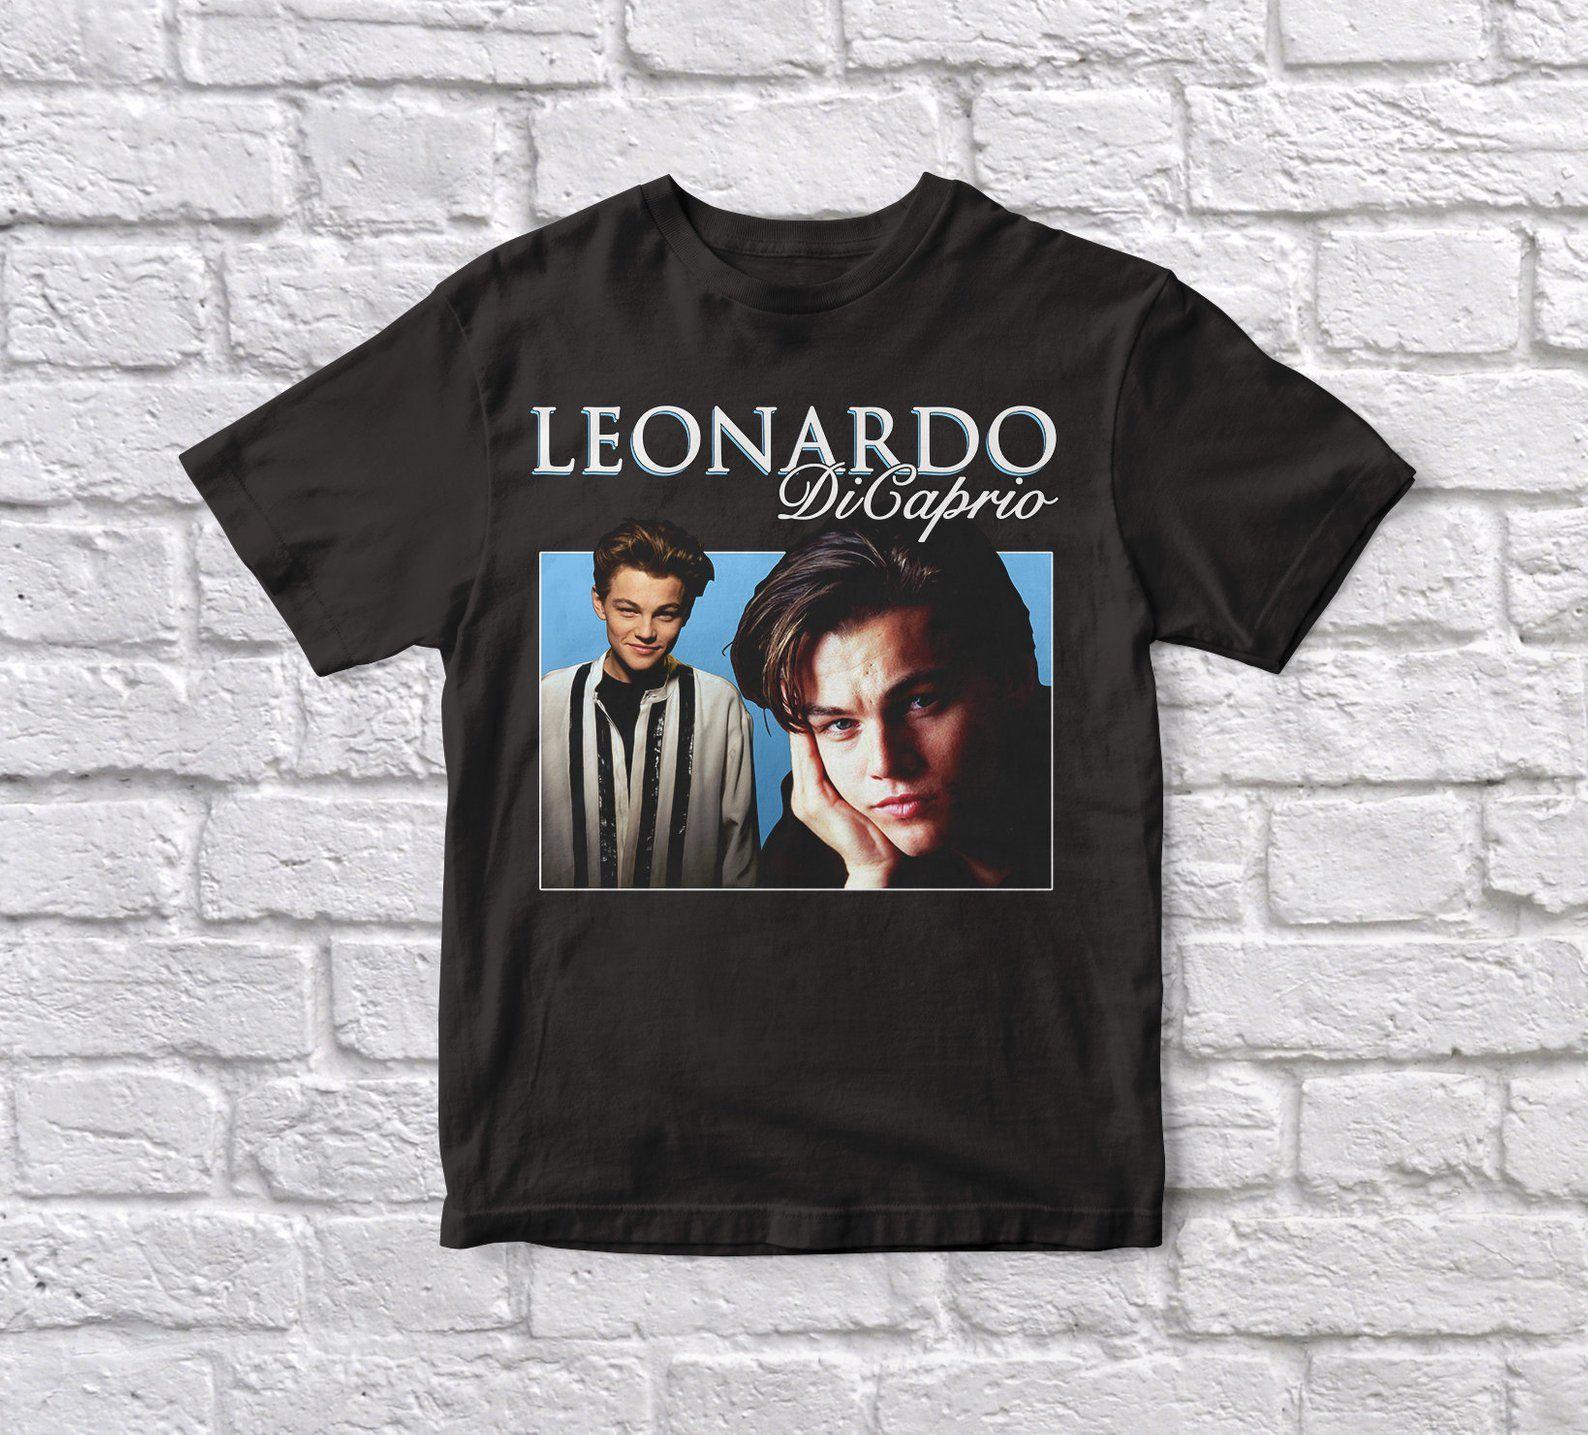 44d8d28d Leonardo DiCaprio Titanic Romeo & Juliet 90's Vintage White Tshirt | Etsy